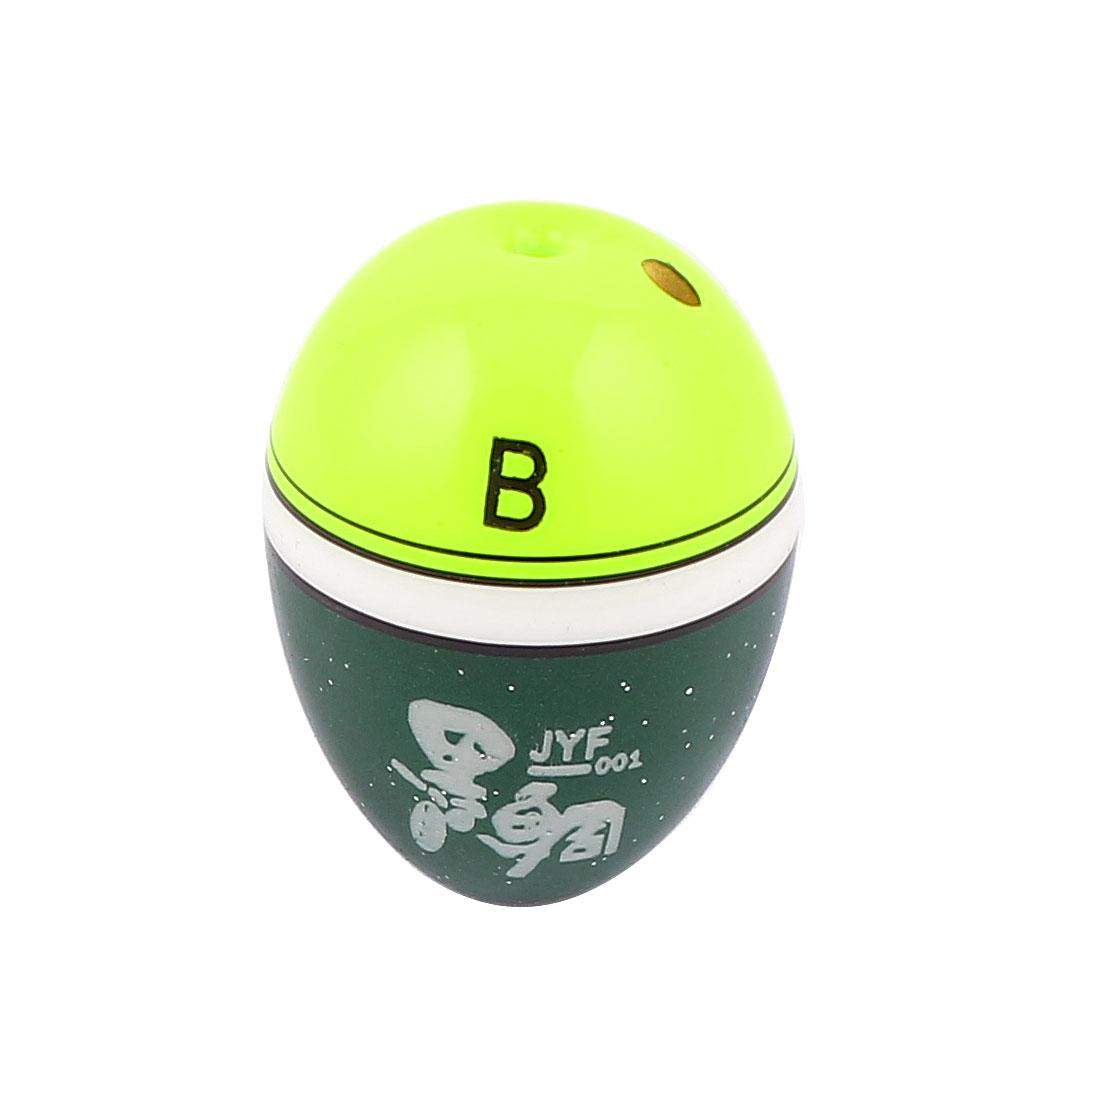 Plastic Oval Shaped Universal Fishing Floater Bobber for Fisherman Light Yellow Green